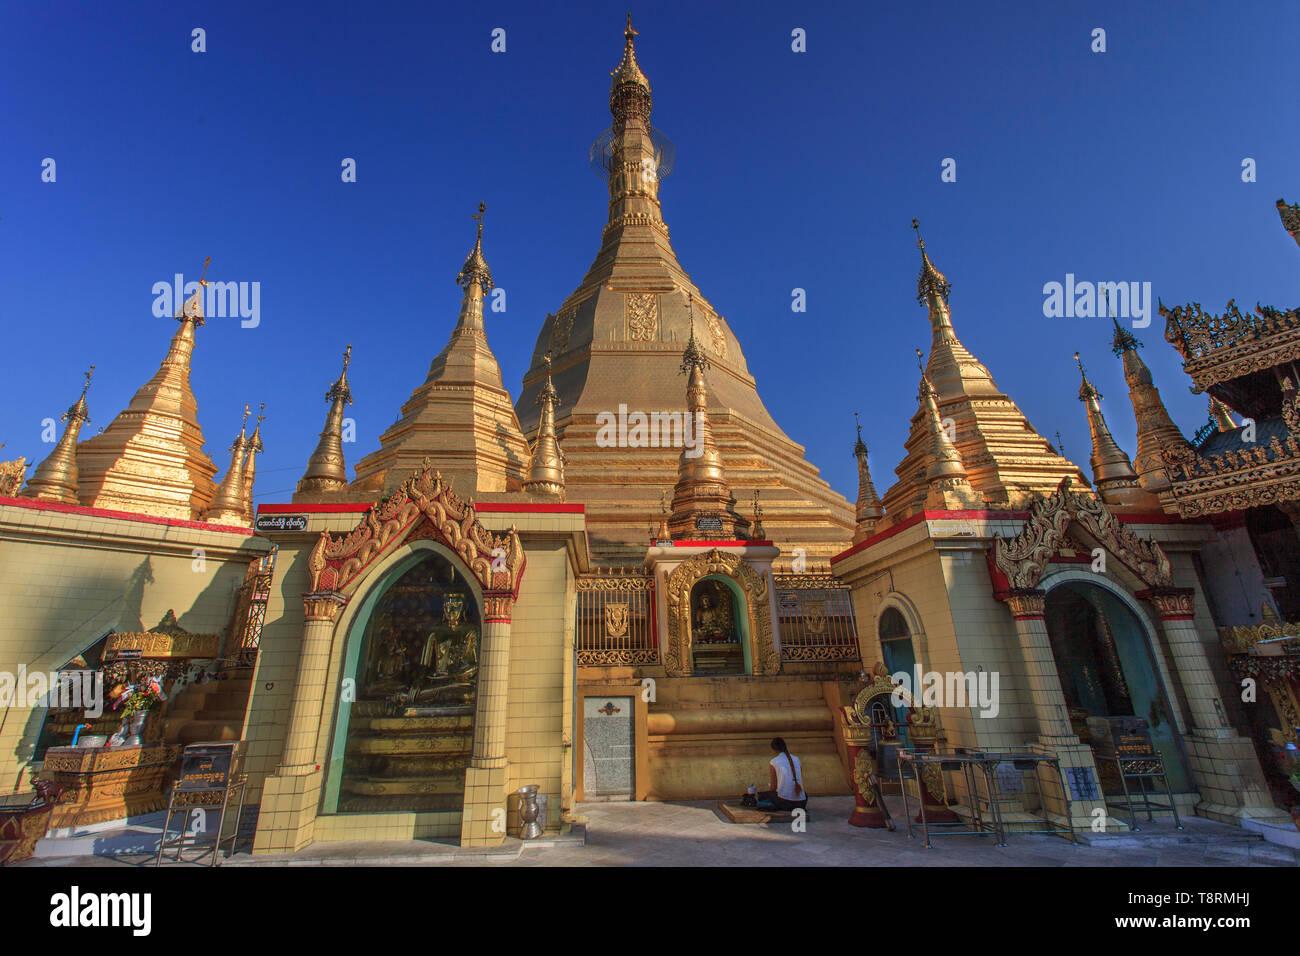 The Sule pagoda in Yangoon (Myanmar) - Stock Image